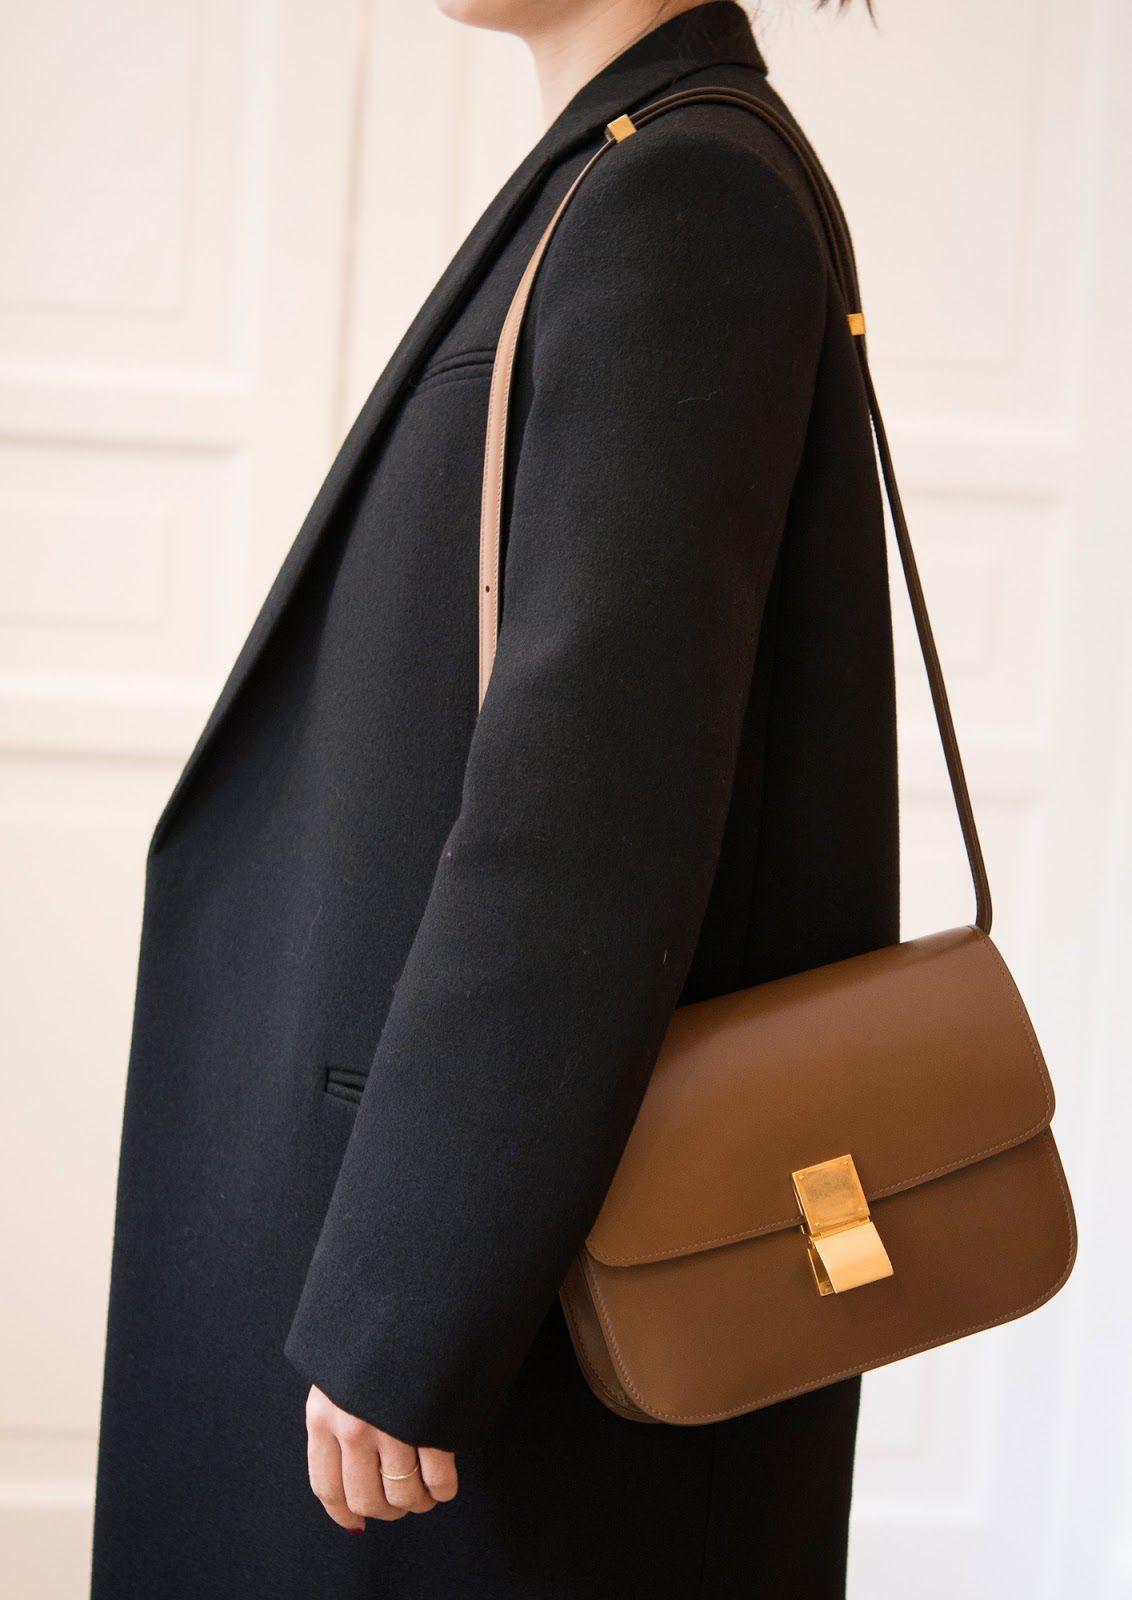 Phoebe Philo打造的Classic Box bag、Luggage Nano、Trio bag等,至今仍是我們心目中的IT Bag。